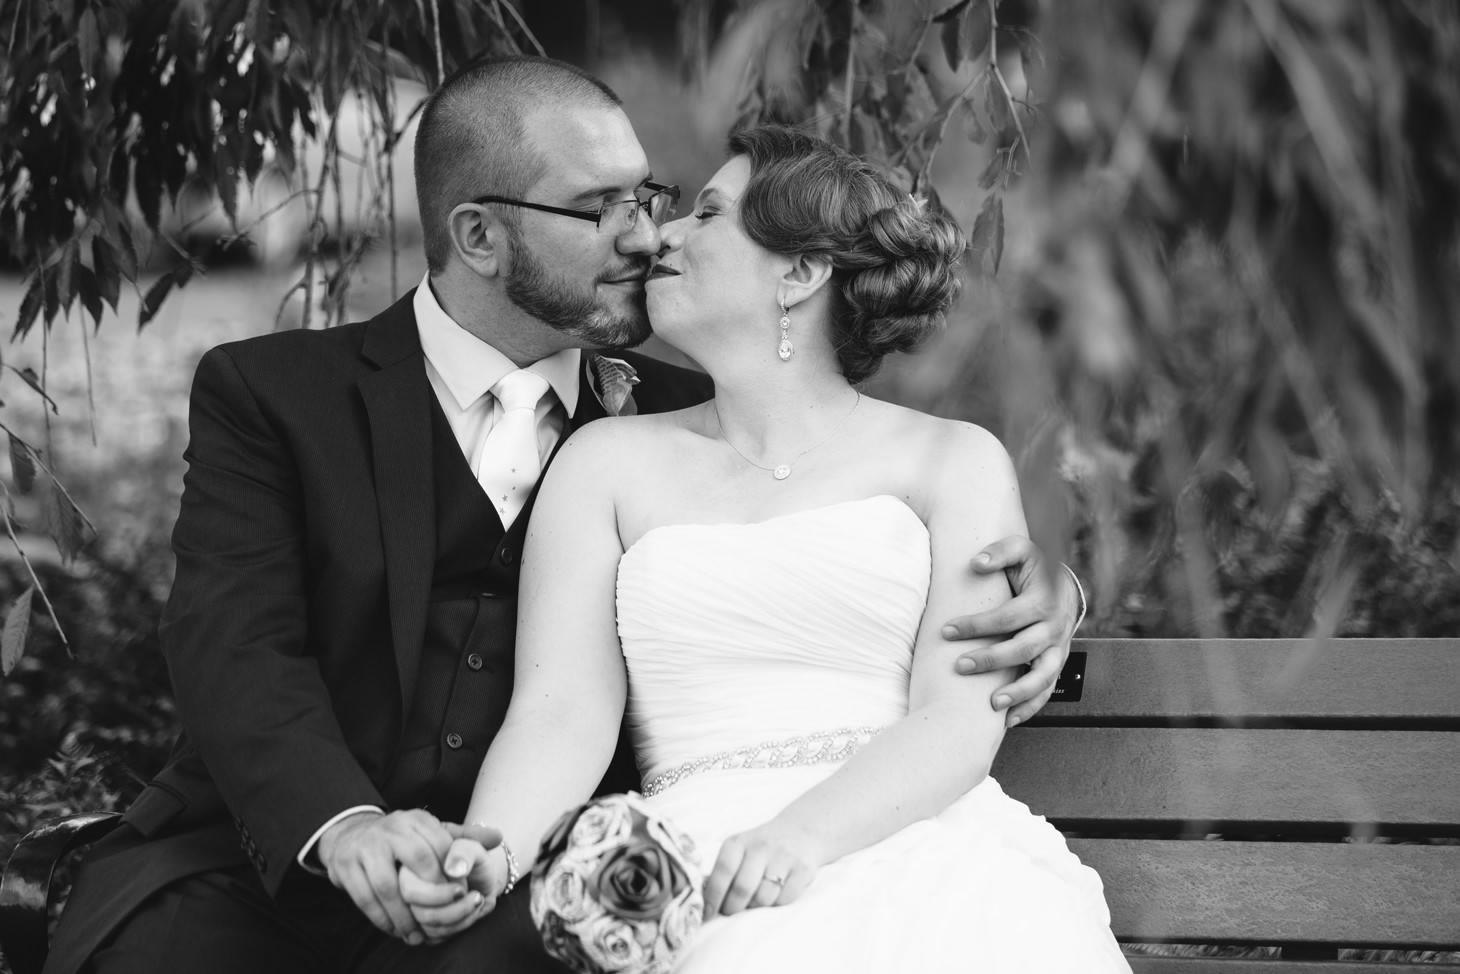 021-nyc-wedding-photographer-nj-nerdy-dr-who-firehouse-wedding-smitten-chickens.jpg